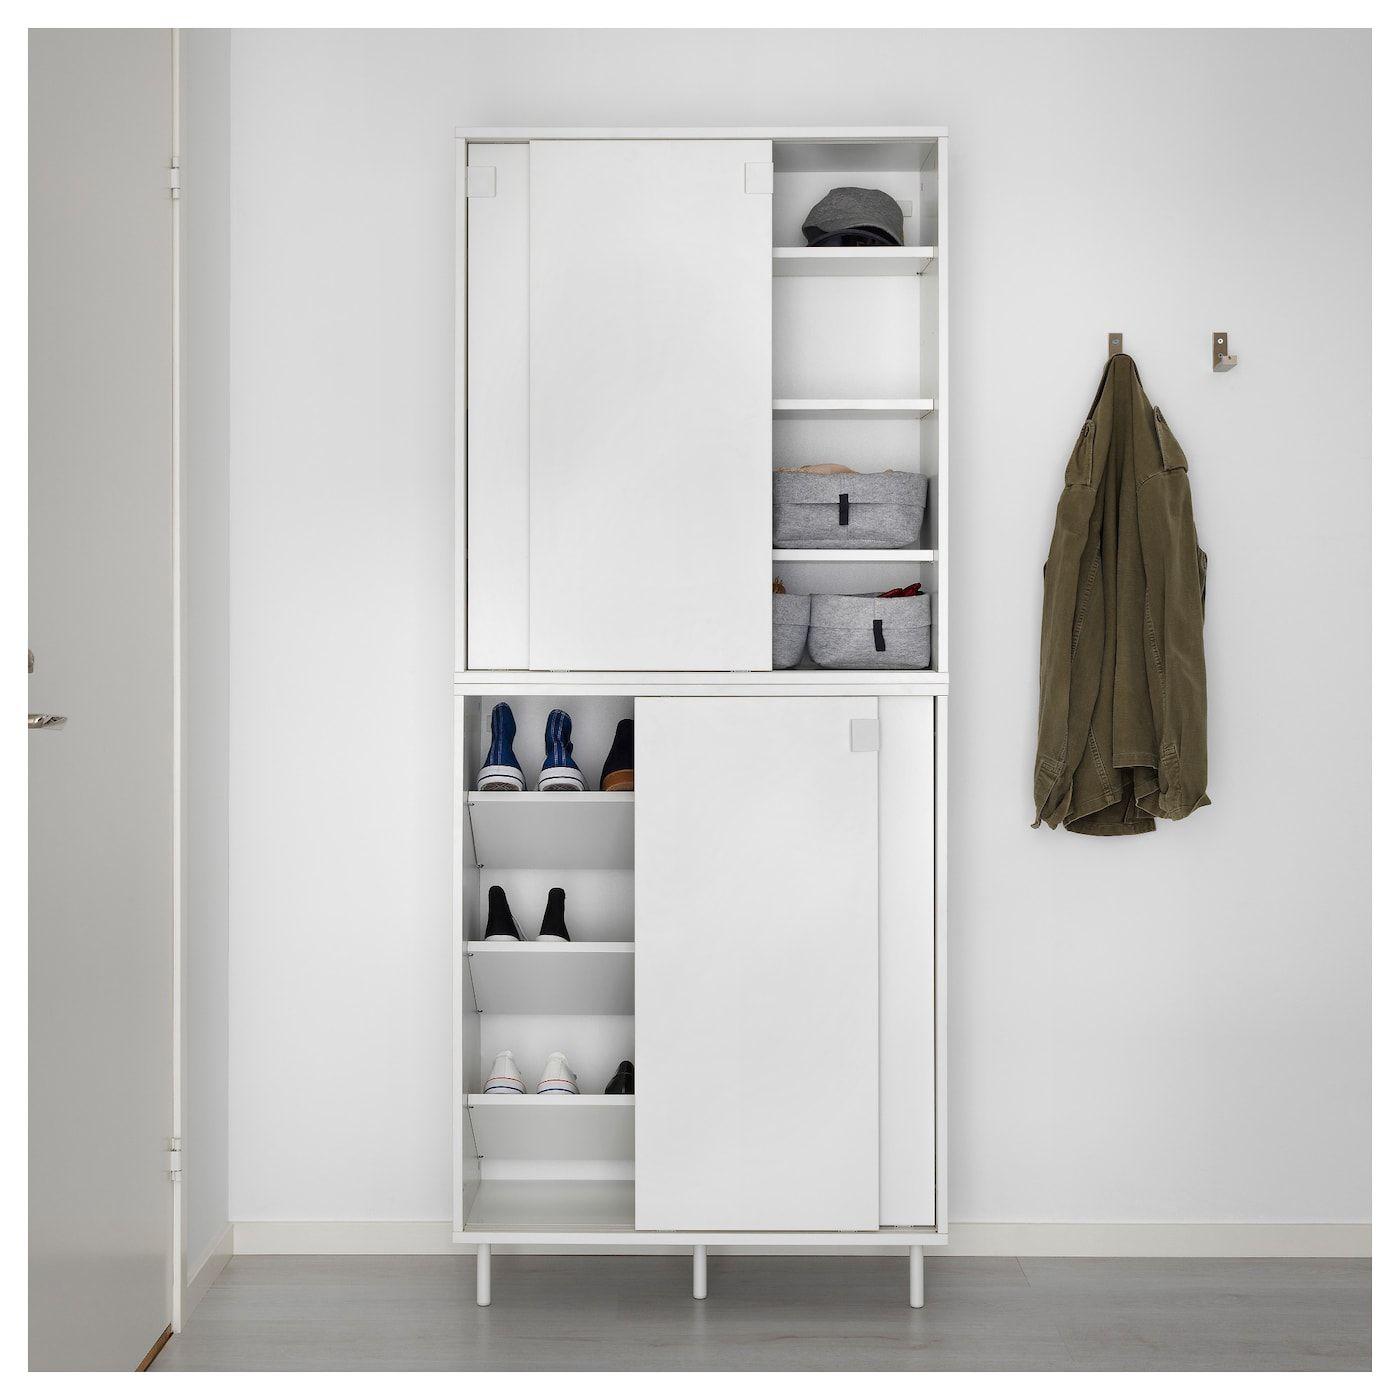 MACKAPÄR Shoe/storage white 31 1/2x40 1/8